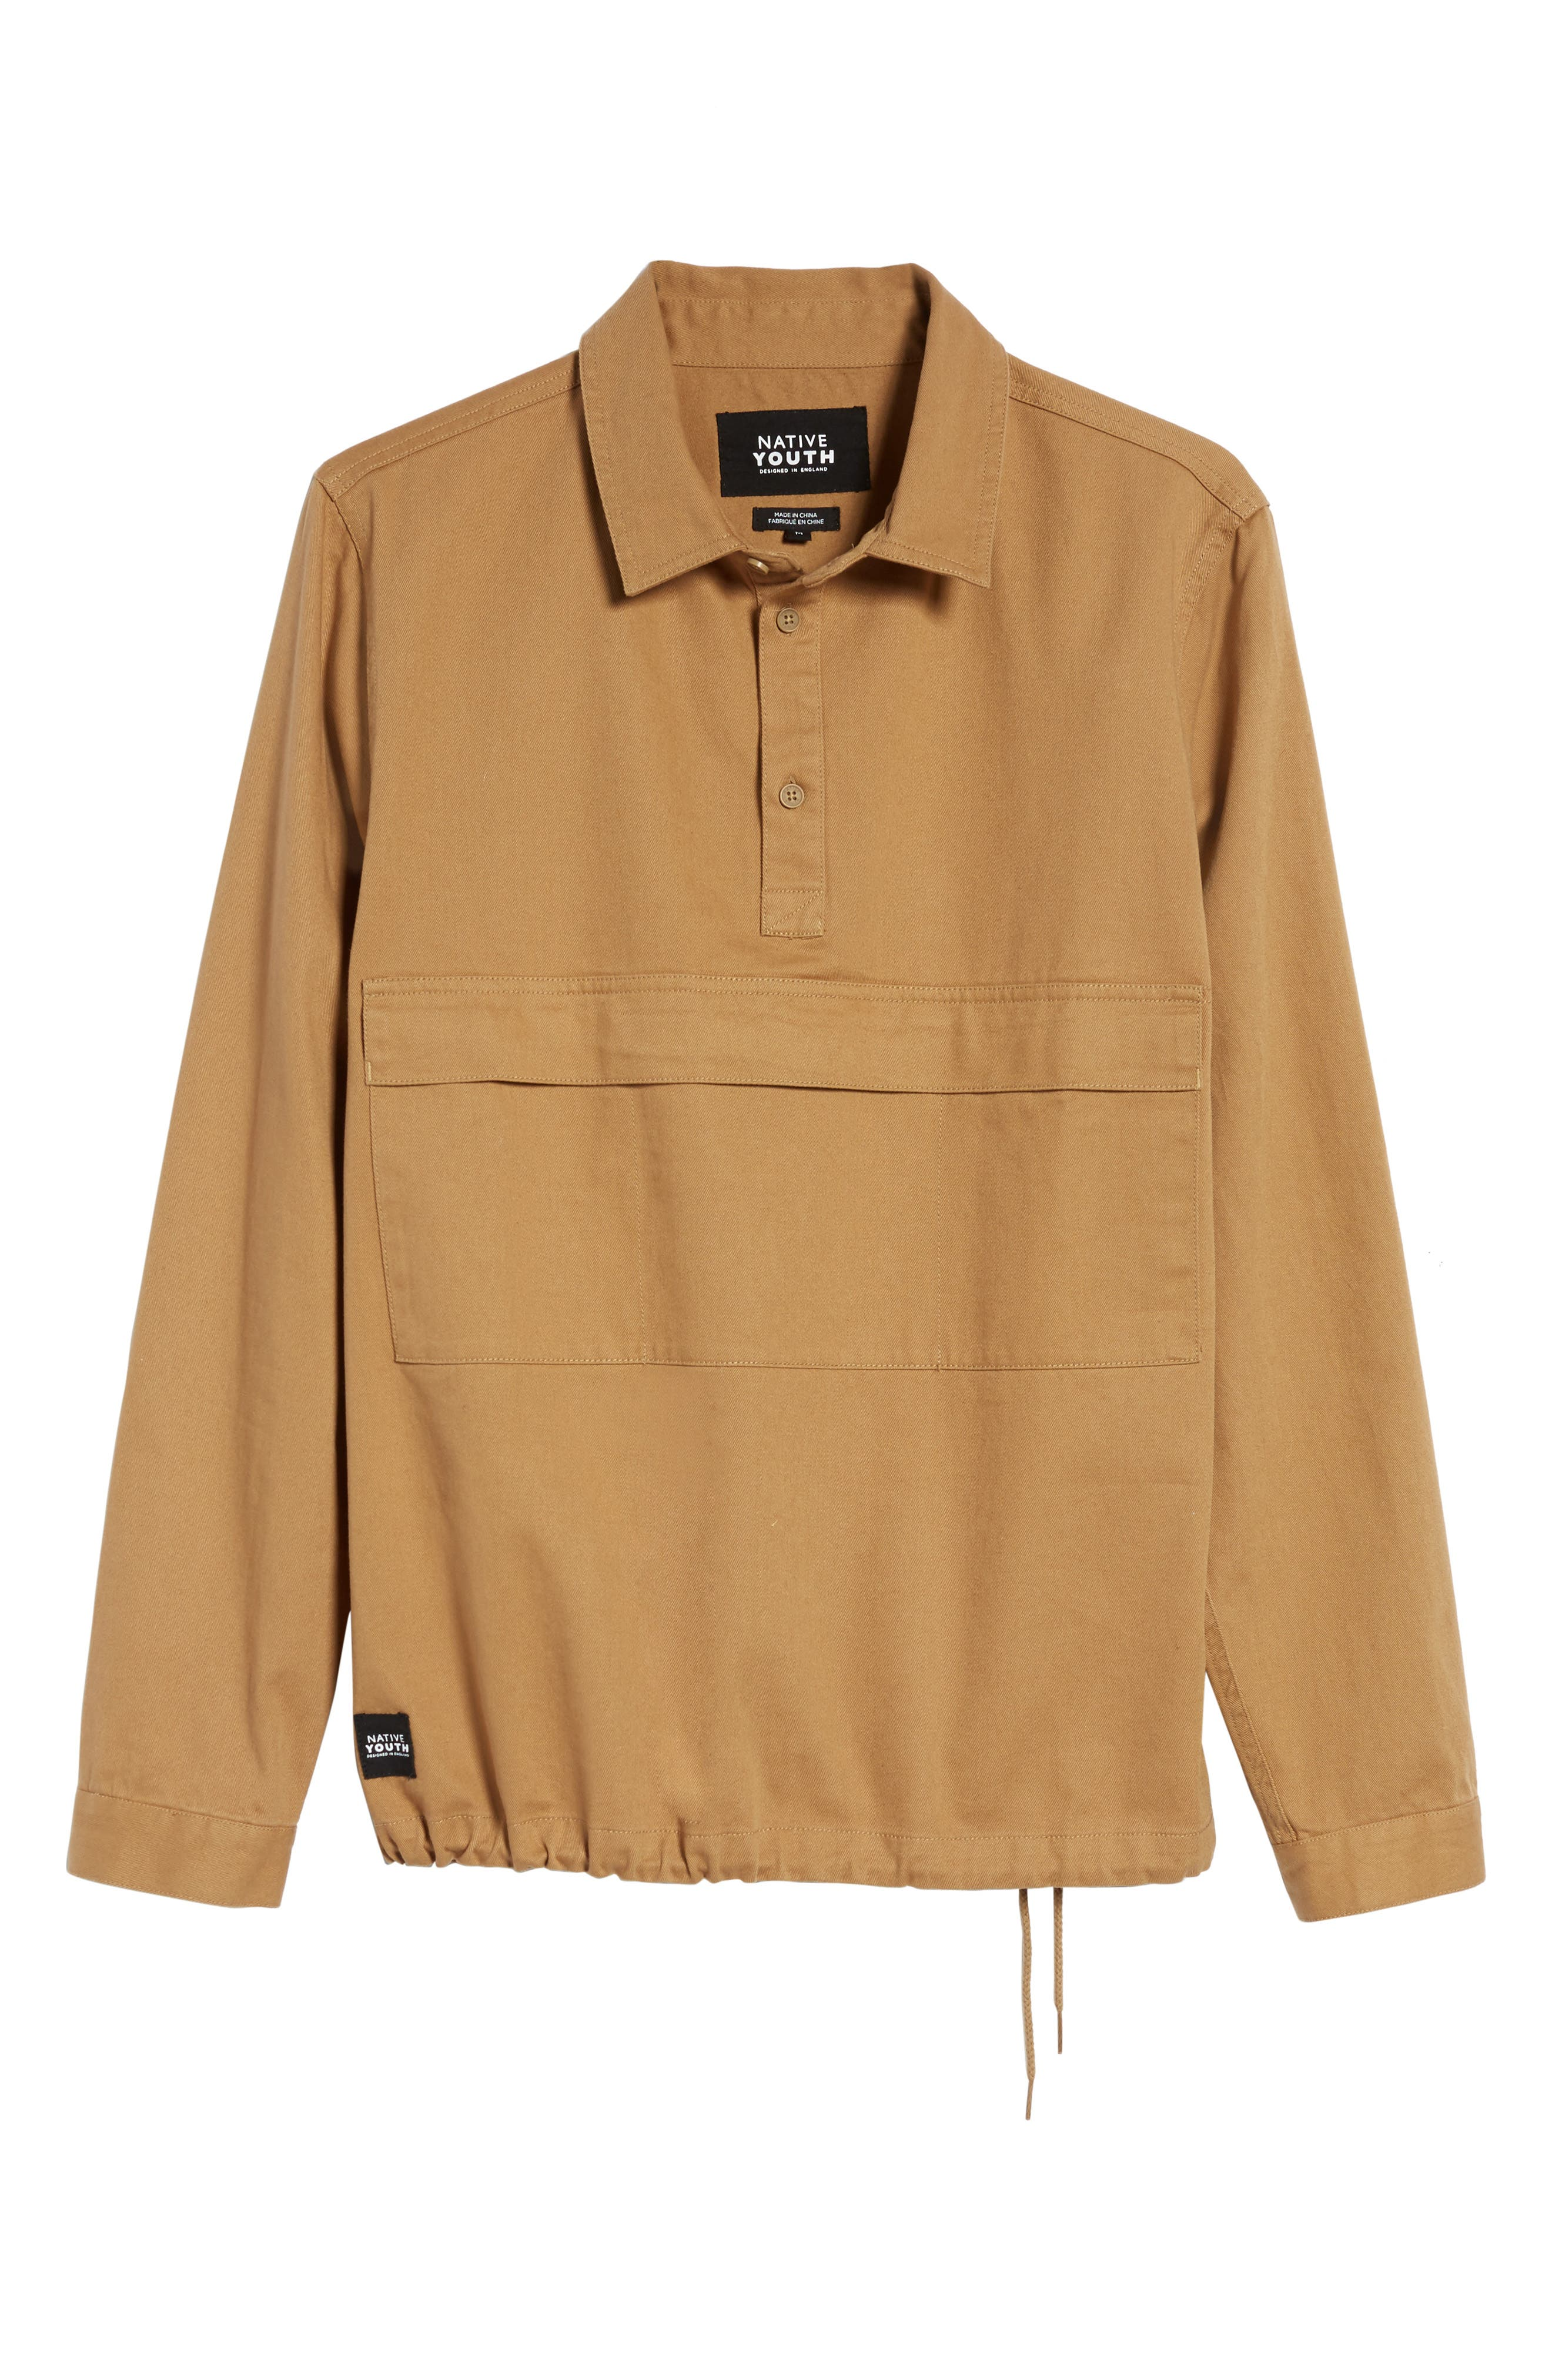 Woodside Twill Shirt,                             Alternate thumbnail 6, color,                             250